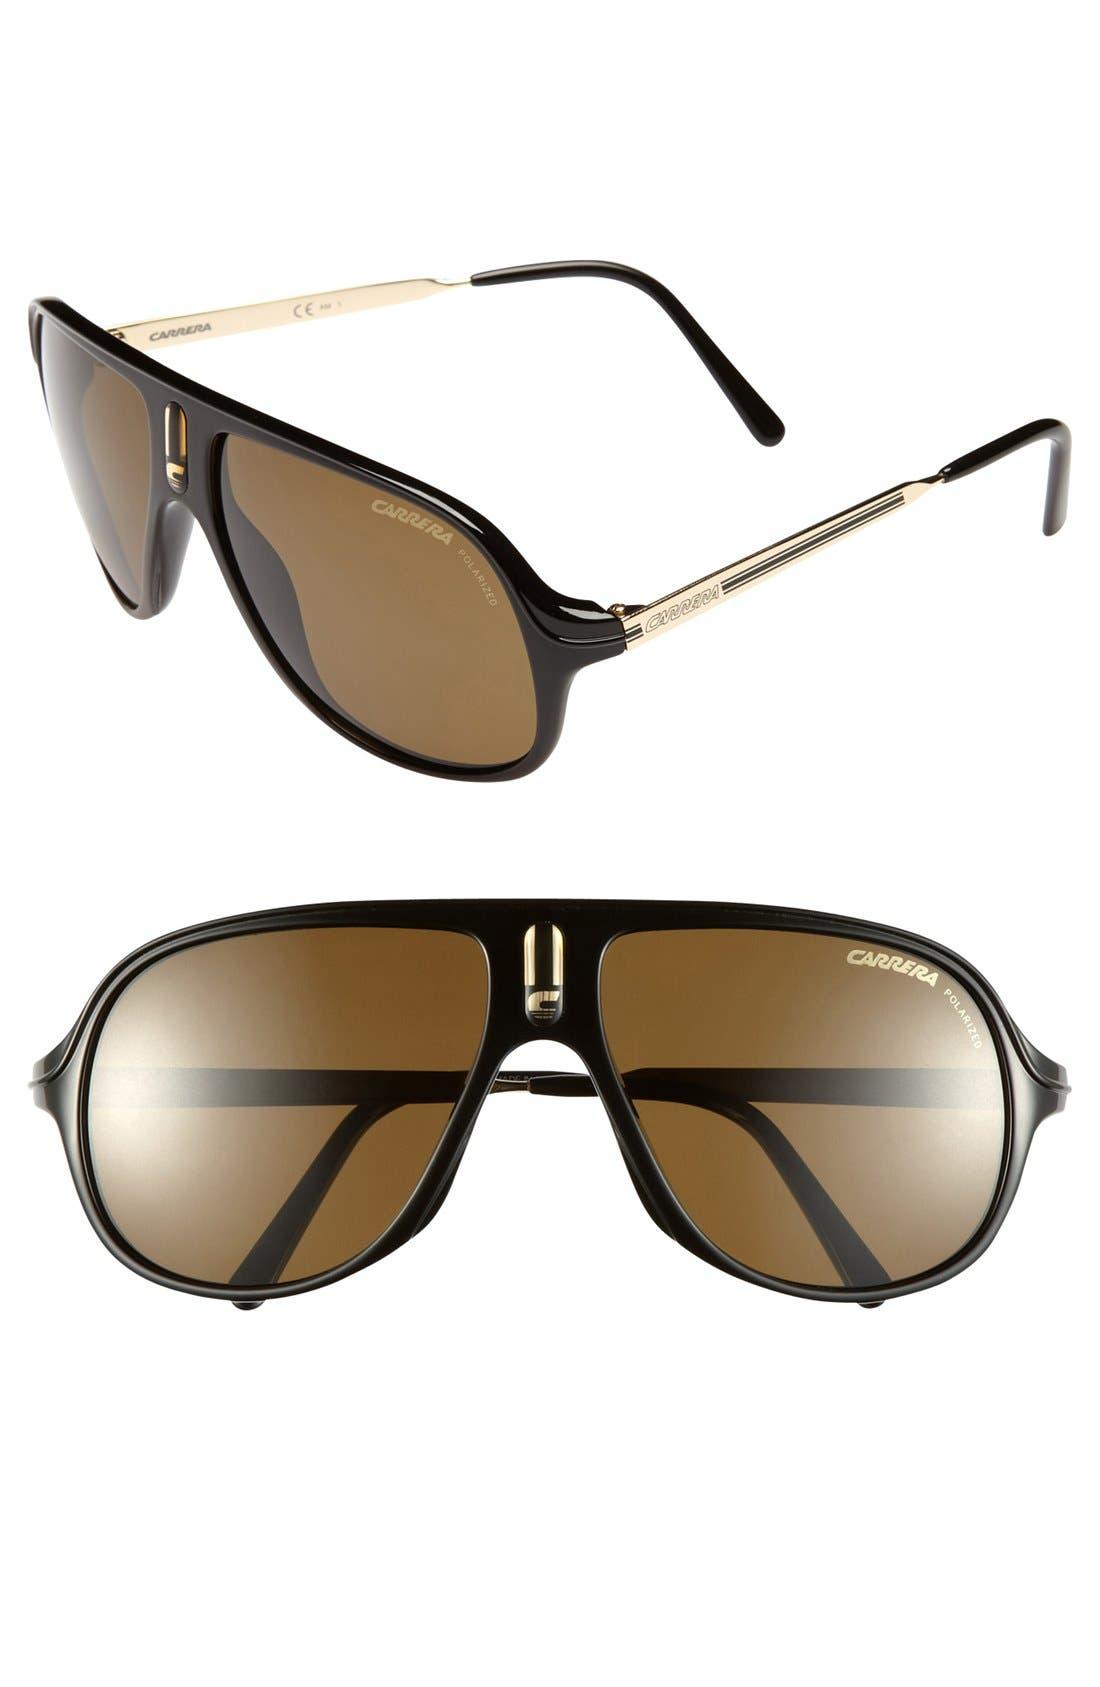 Alternate Image 1 Selected - Carrera Eyewear 'Safari' 62mm Retro Inspired Aviator Sunglasses